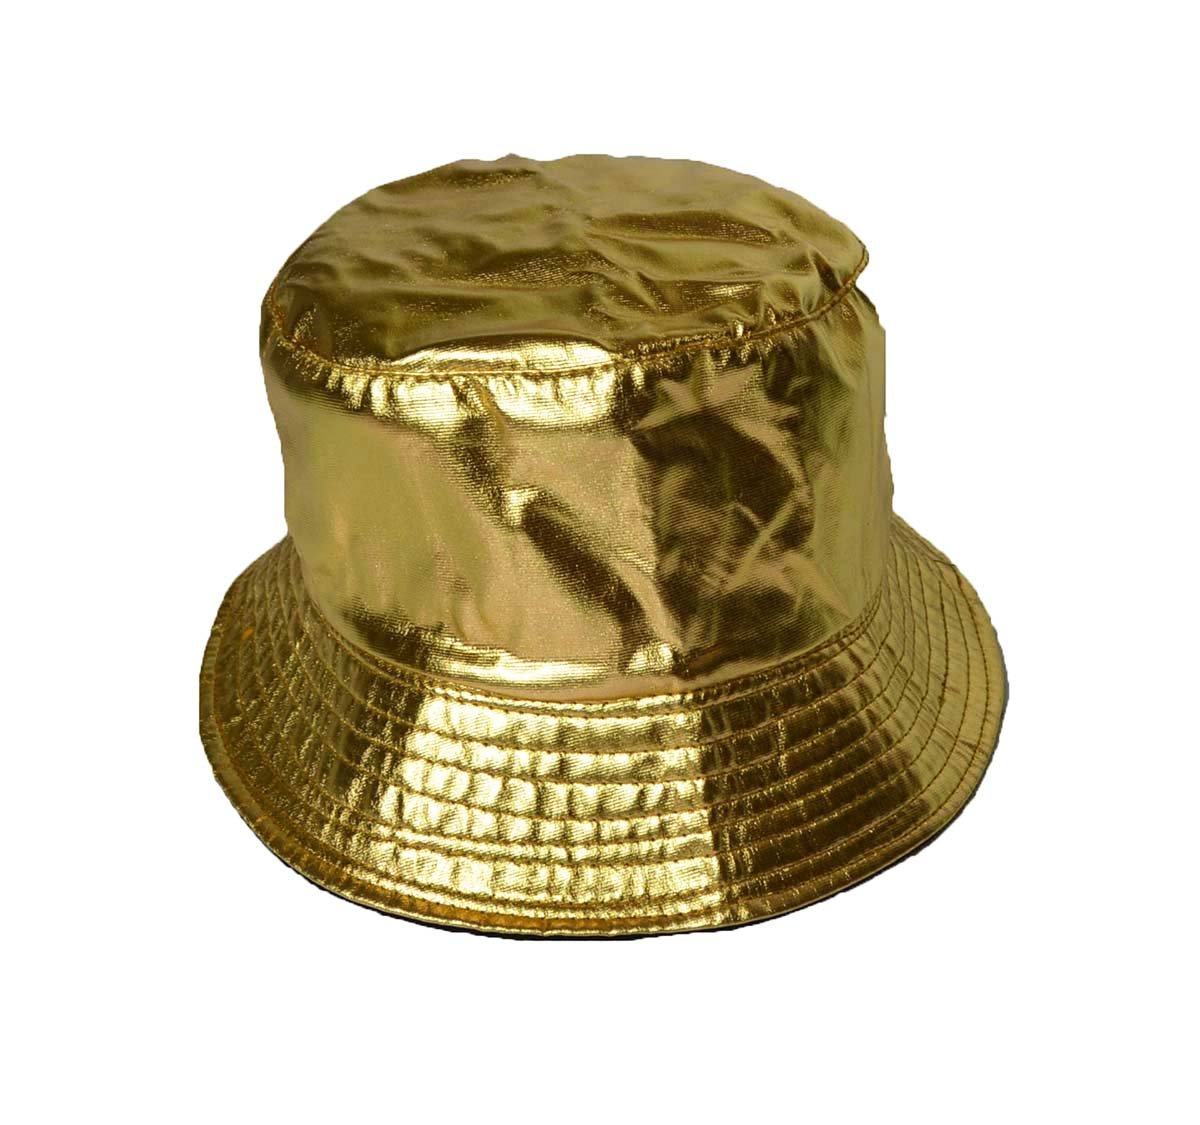 3625d103f13 KGM Accessories Groovy shiny Gold bucket sun hat  Amazon.co.uk  Garden    Outdoors